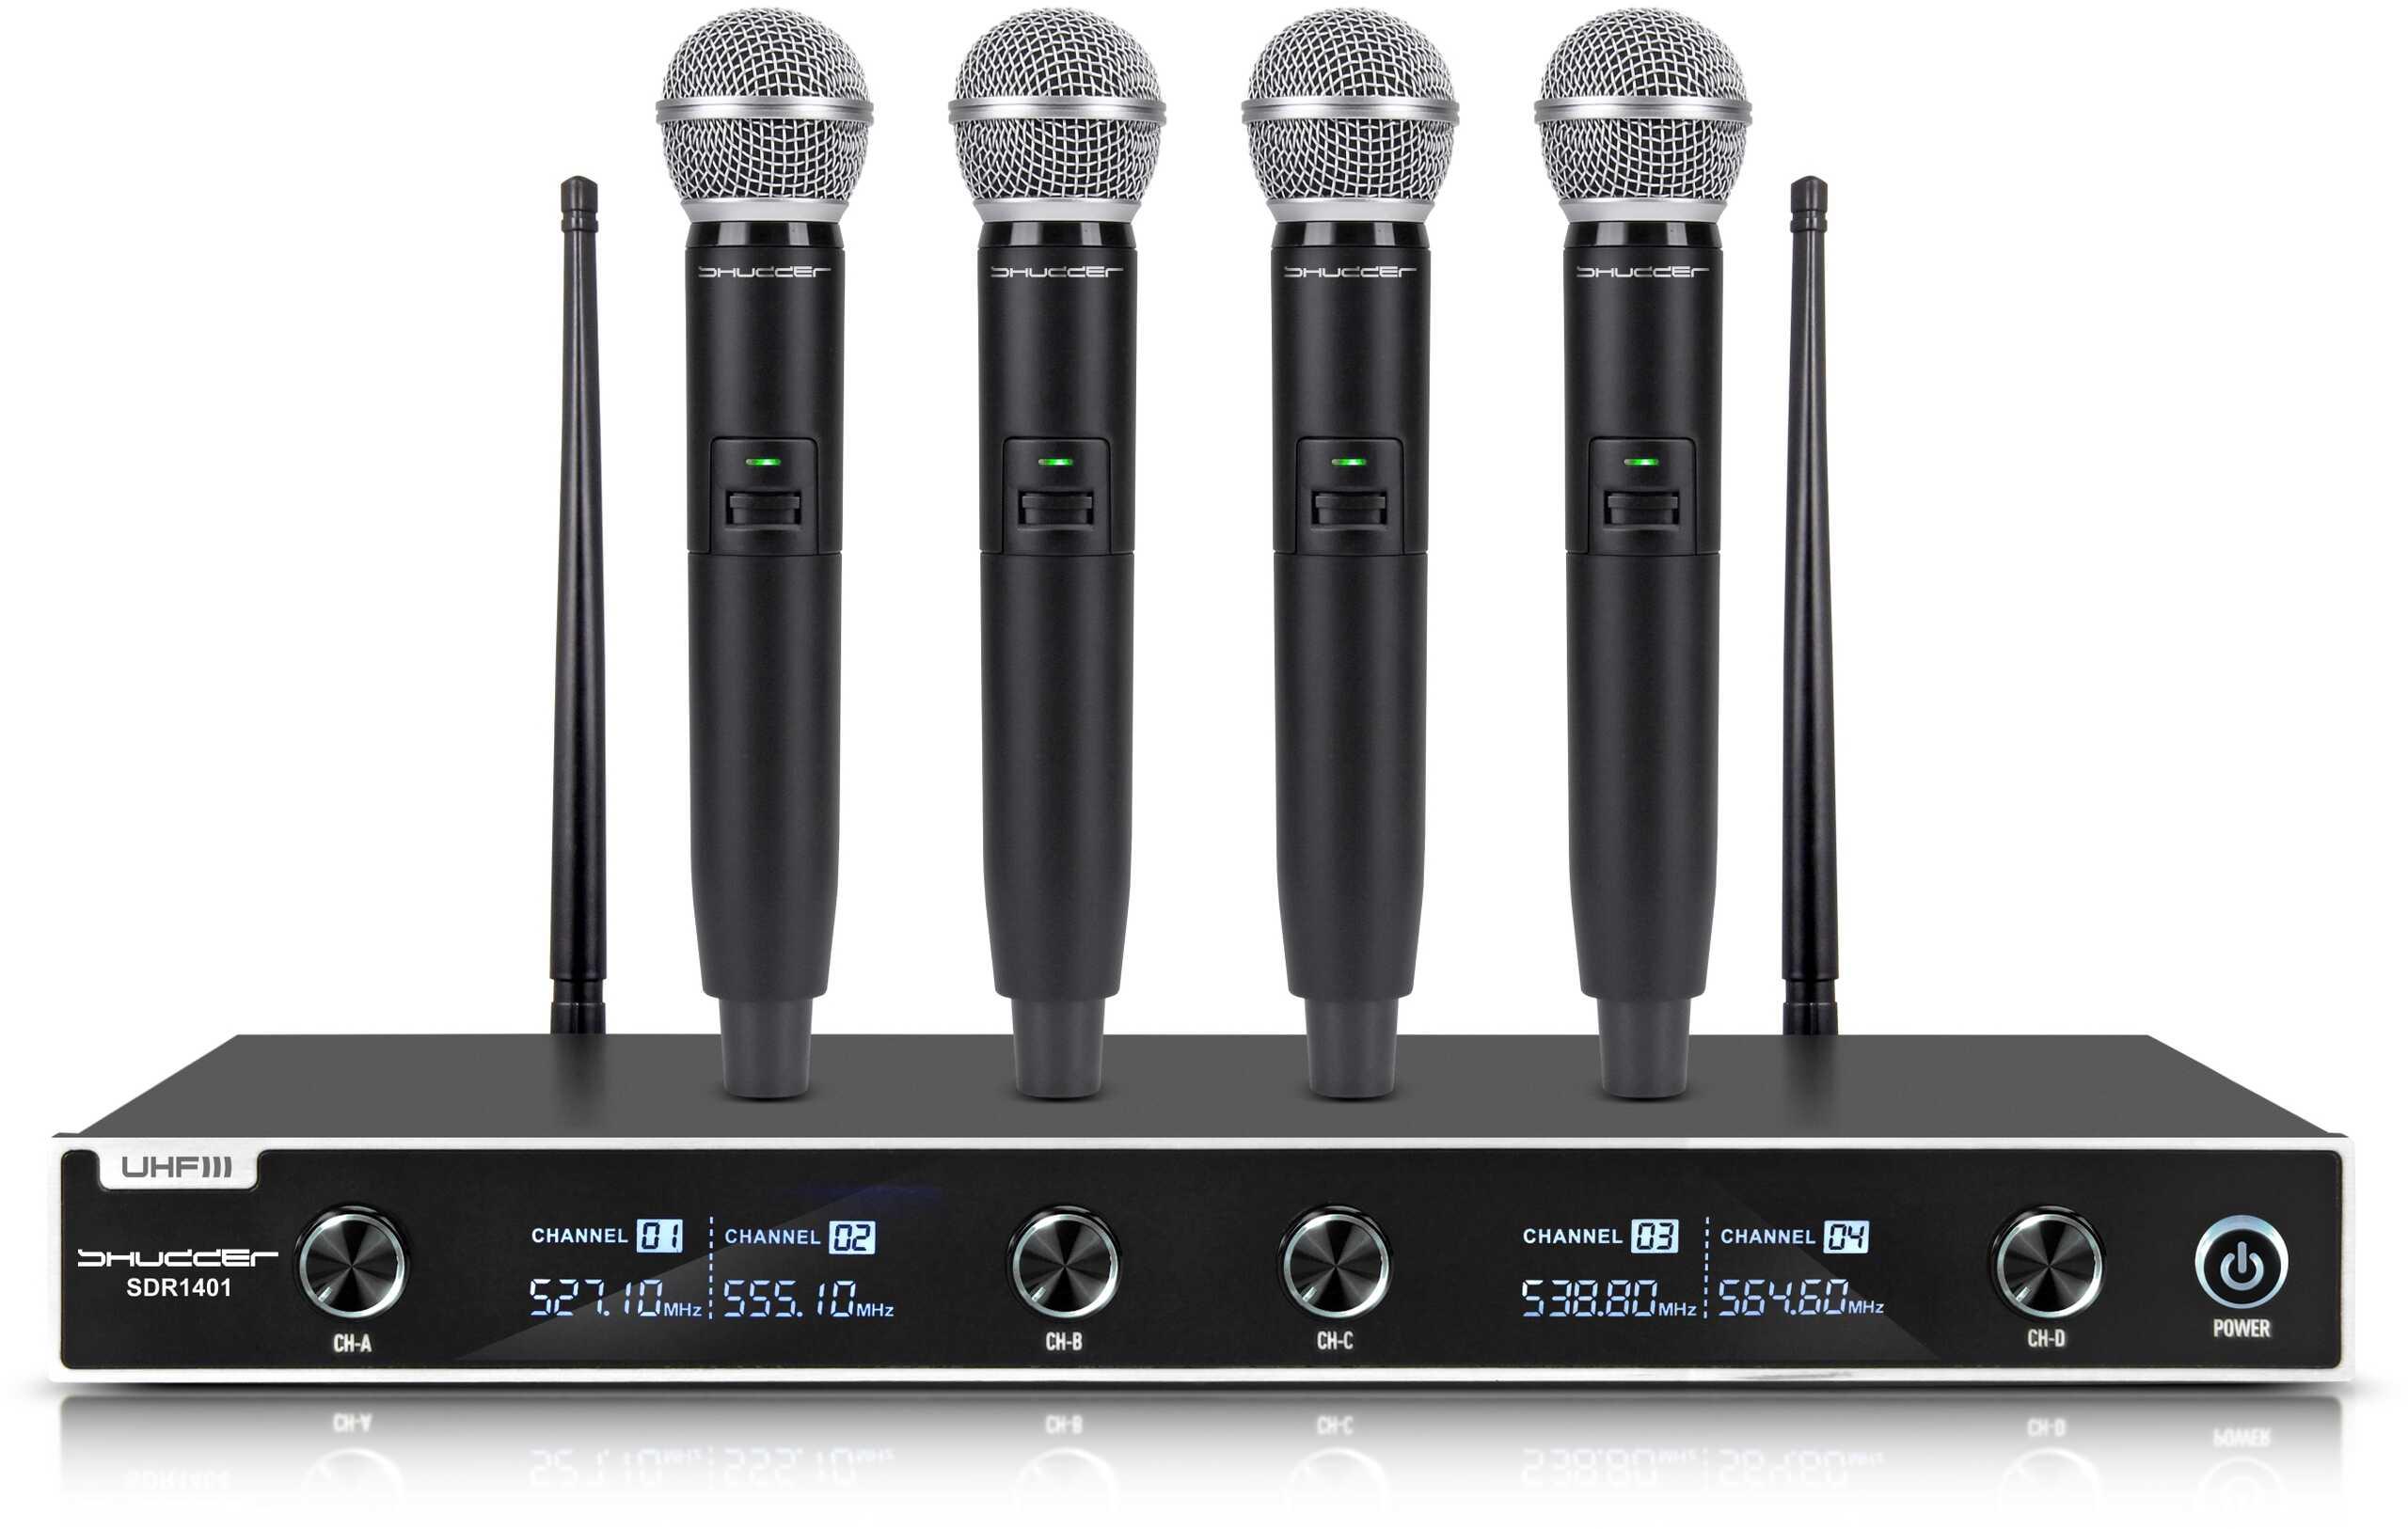 Mikrofony bezprzewodowe Shudder UHF 4 mikrofony